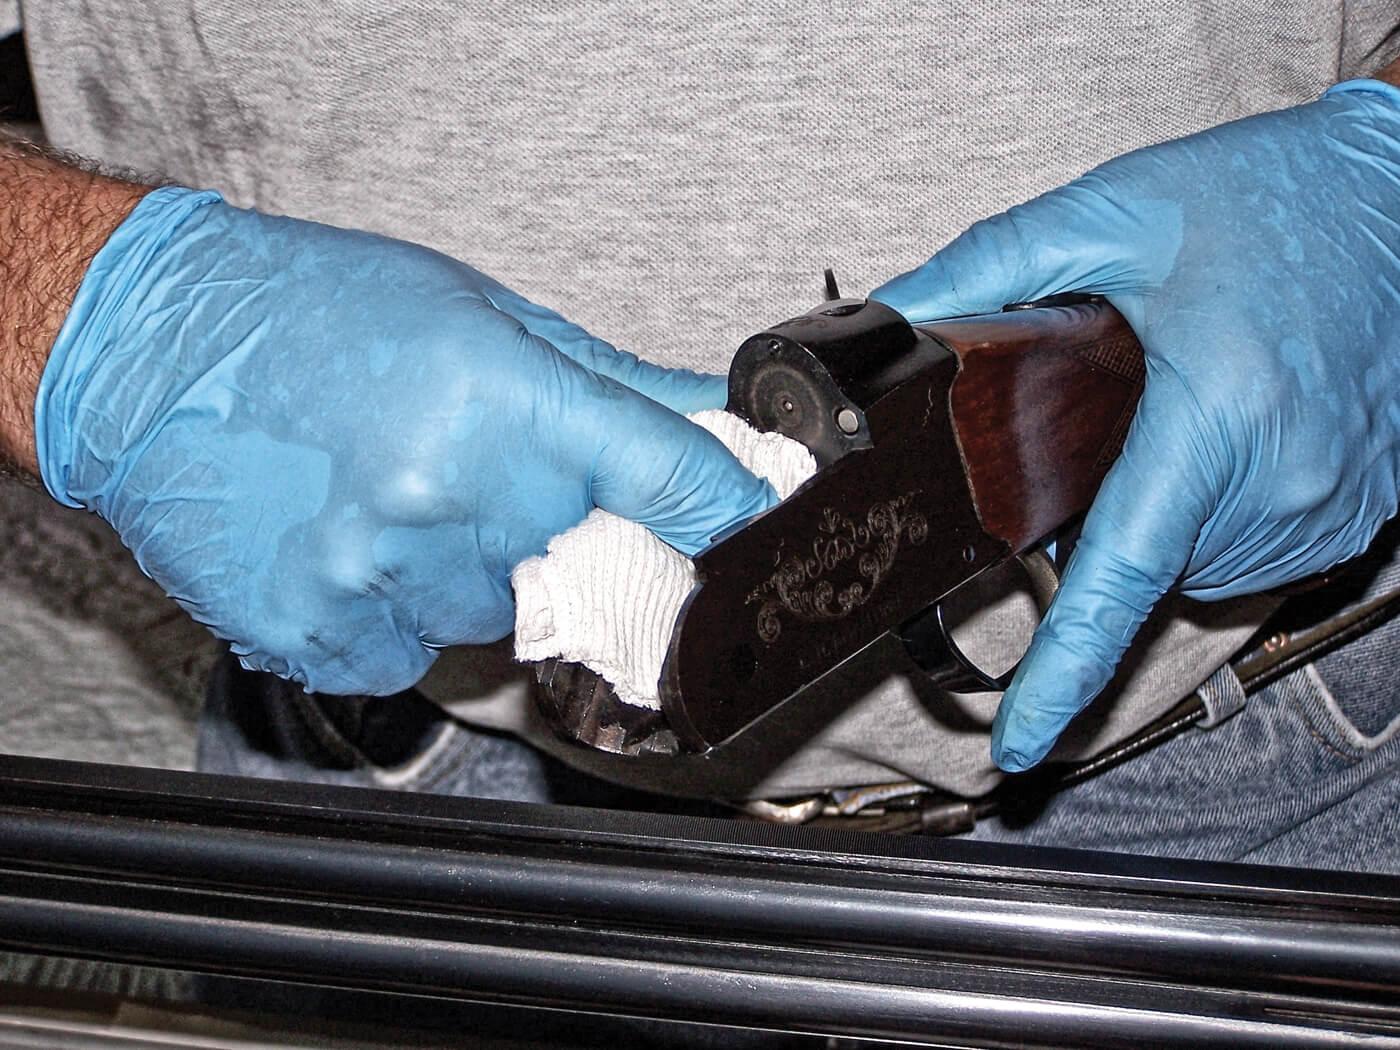 Gloved hands cleaning an over-under shotgun